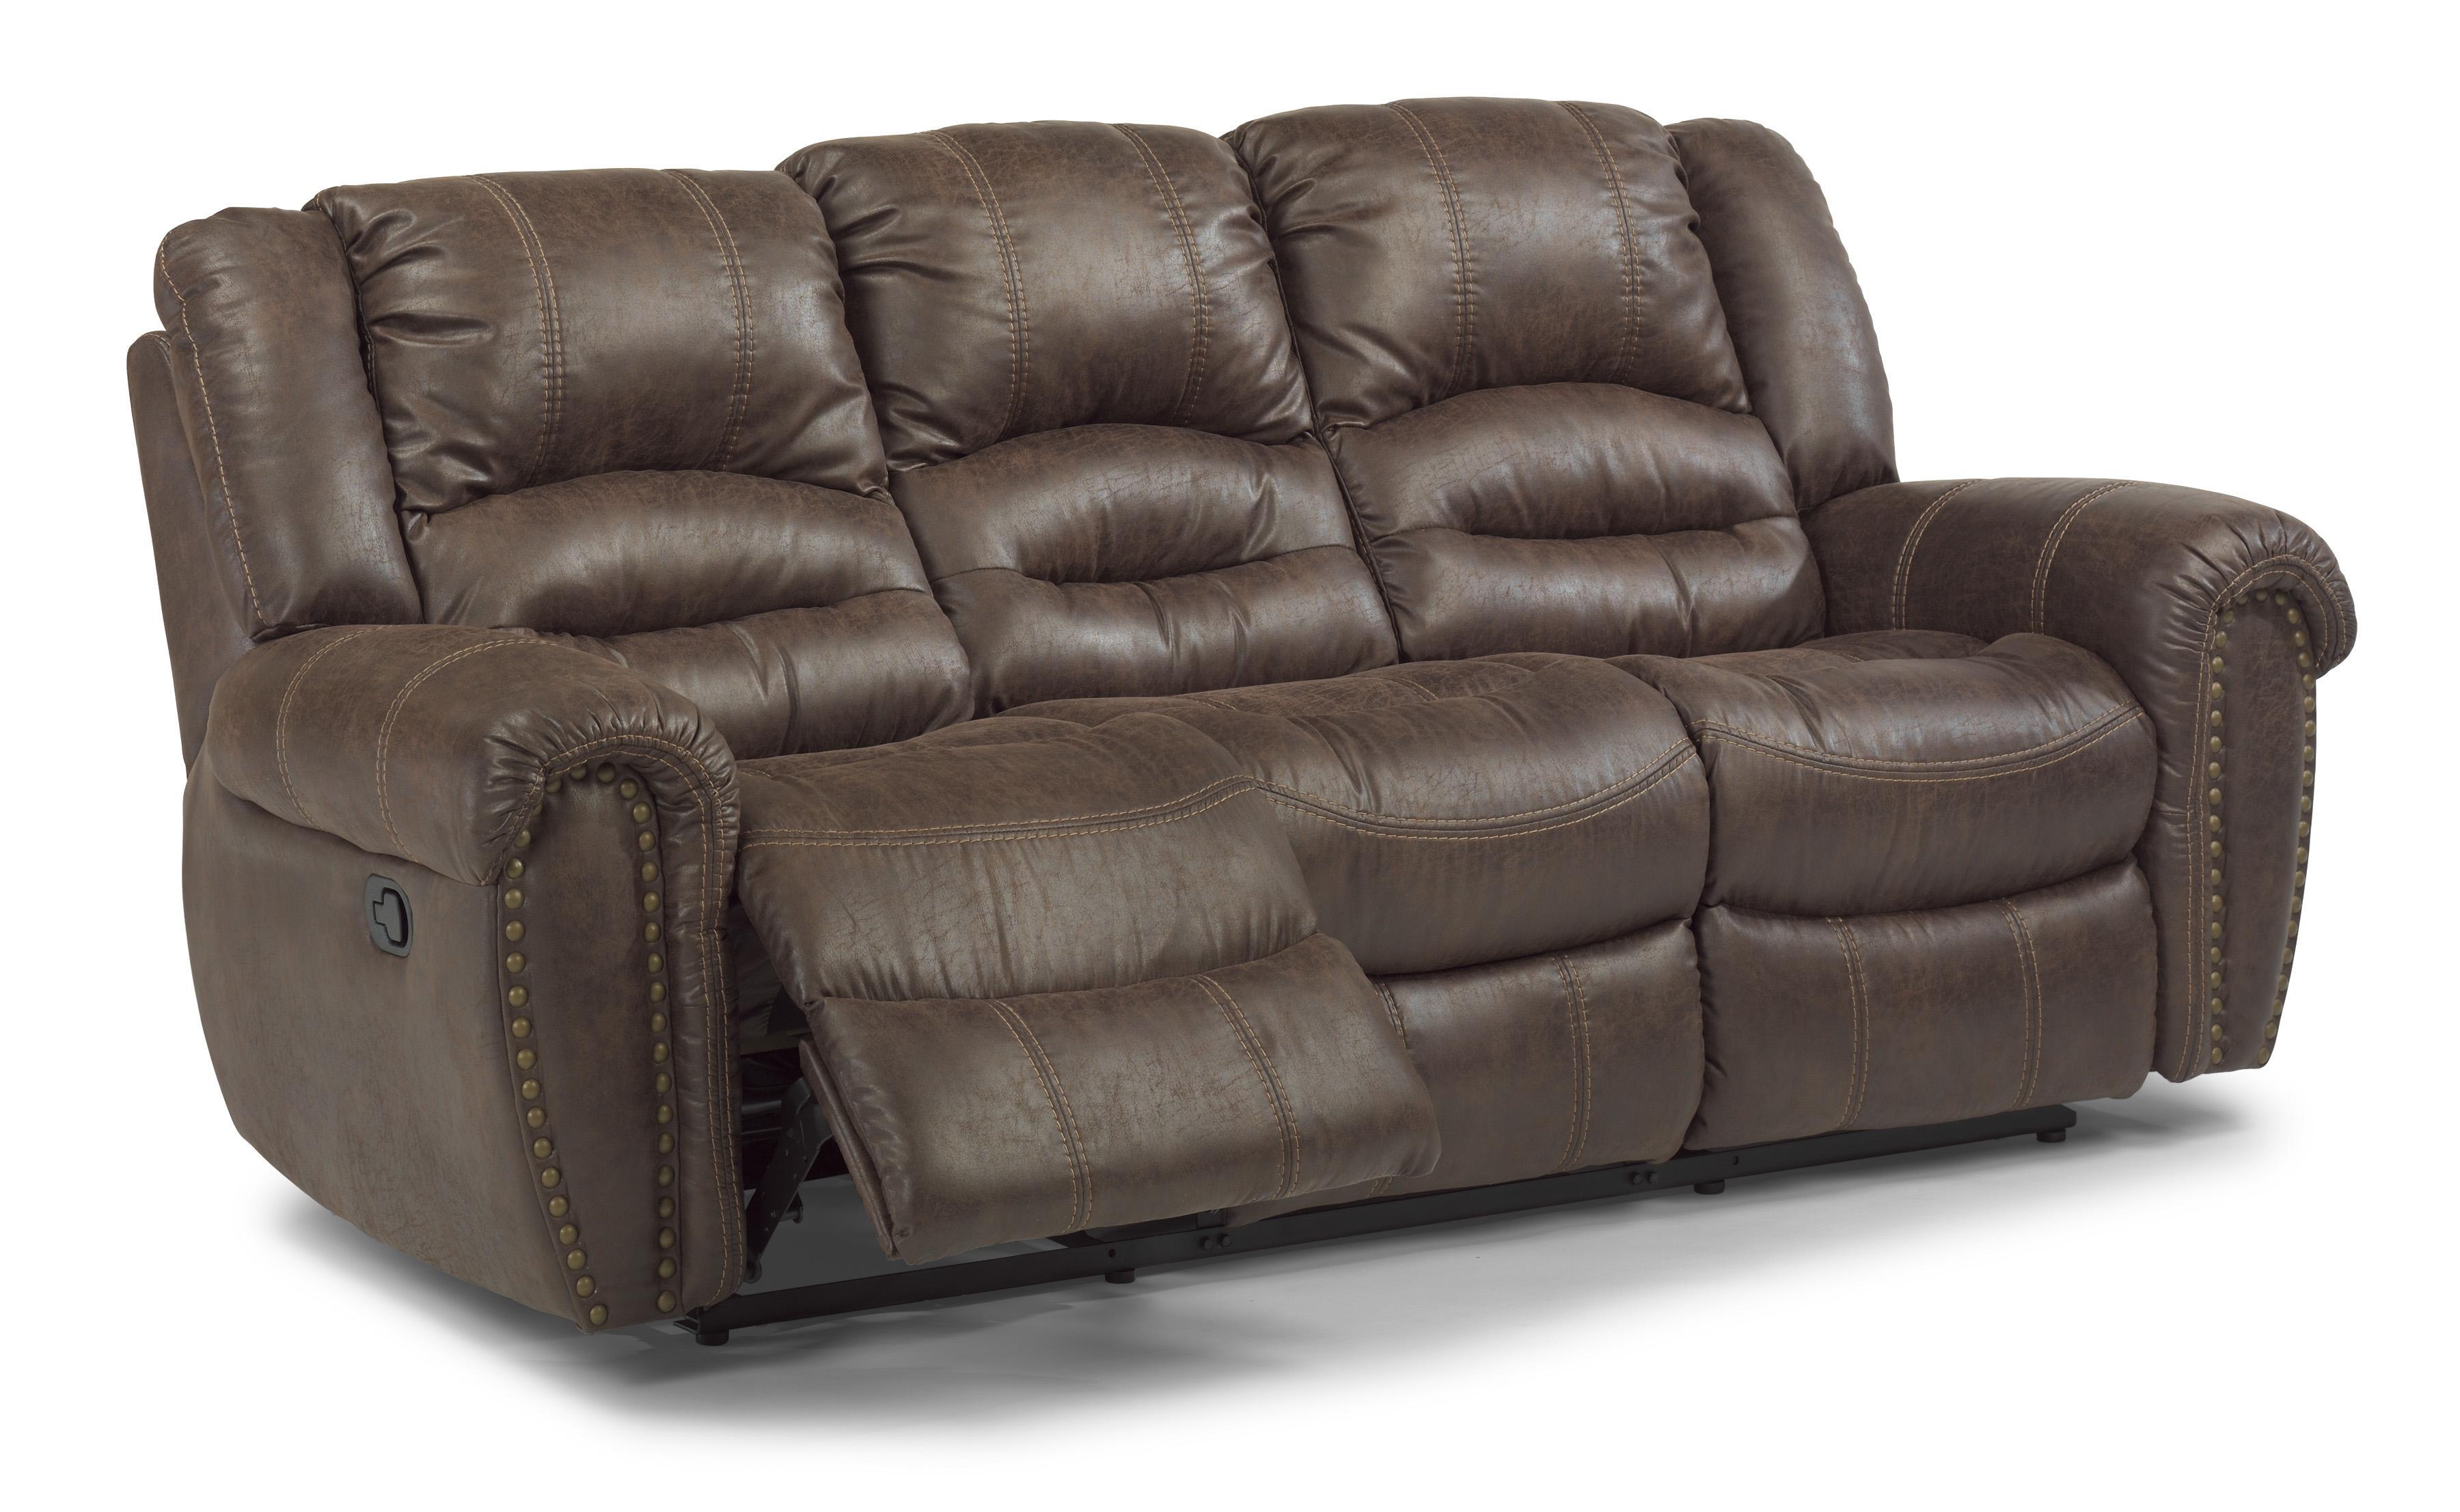 Flexsteel latitudes downtown transitional power double reclining sofa wayside furniture - Sofa reclinable ...